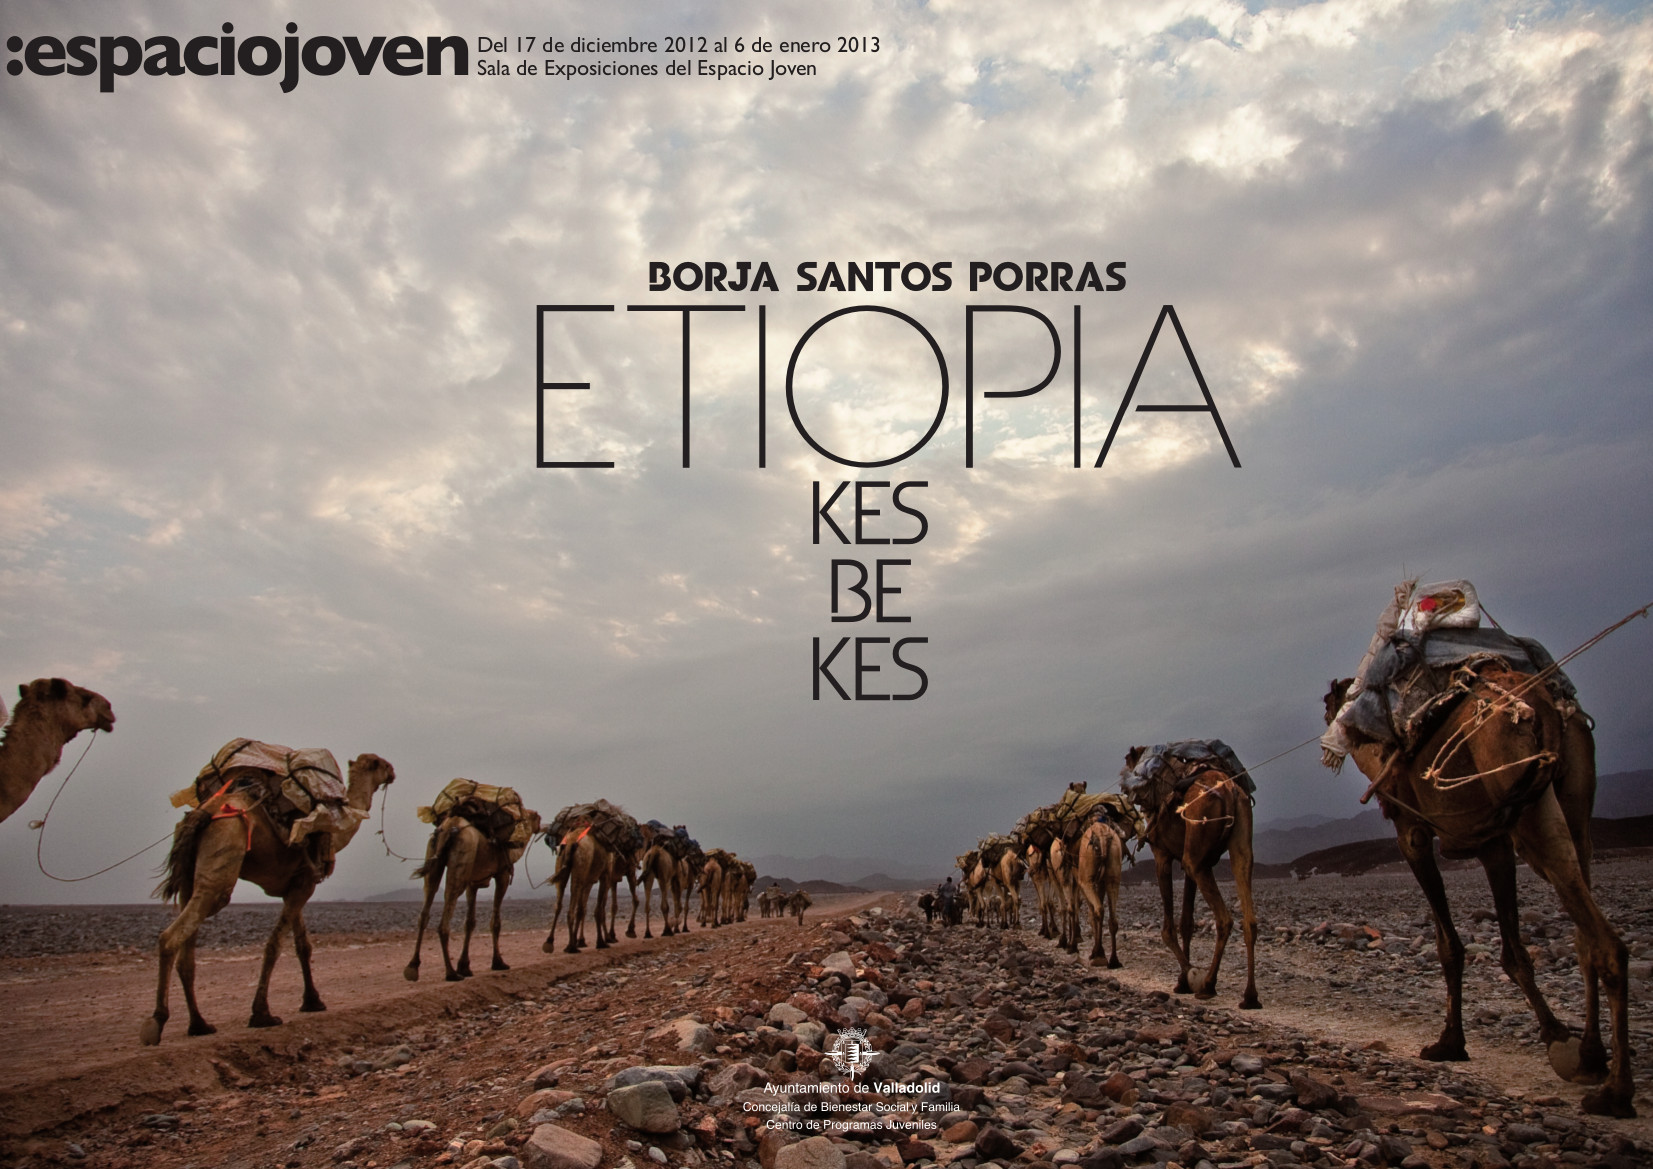 "ETIOPÍA ""KES BE KES"" | borjasantosporras.org"